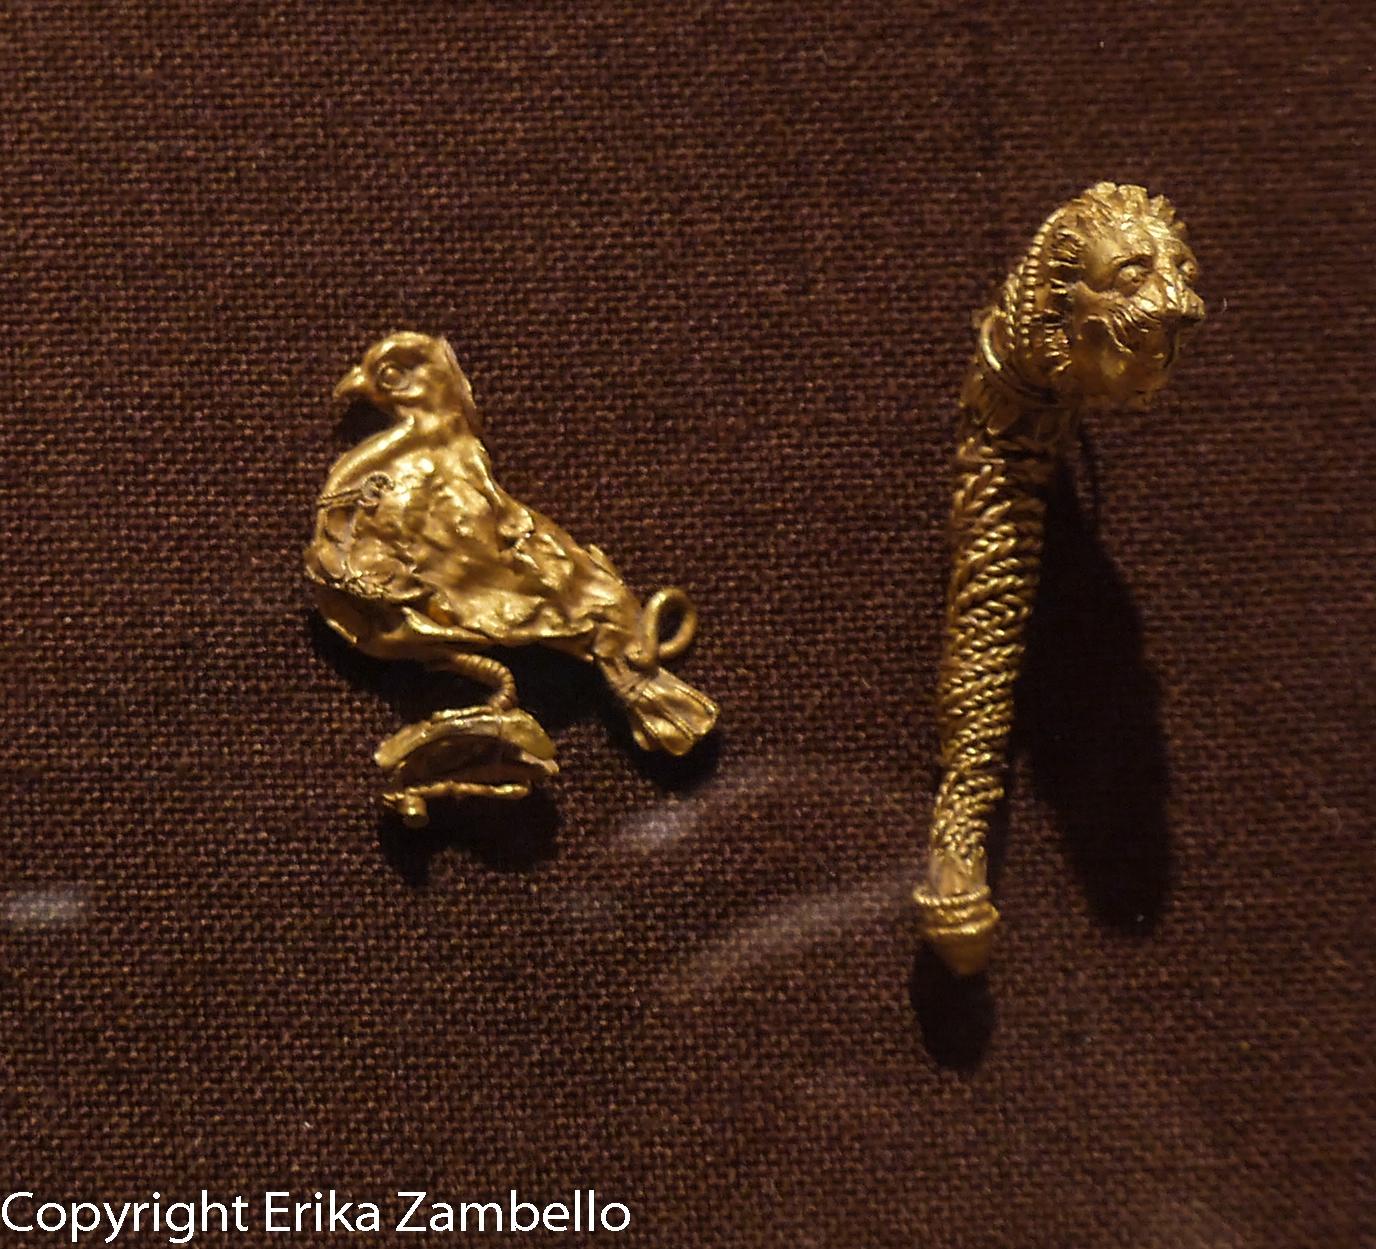 bird, gold, ancient, artifact, bird